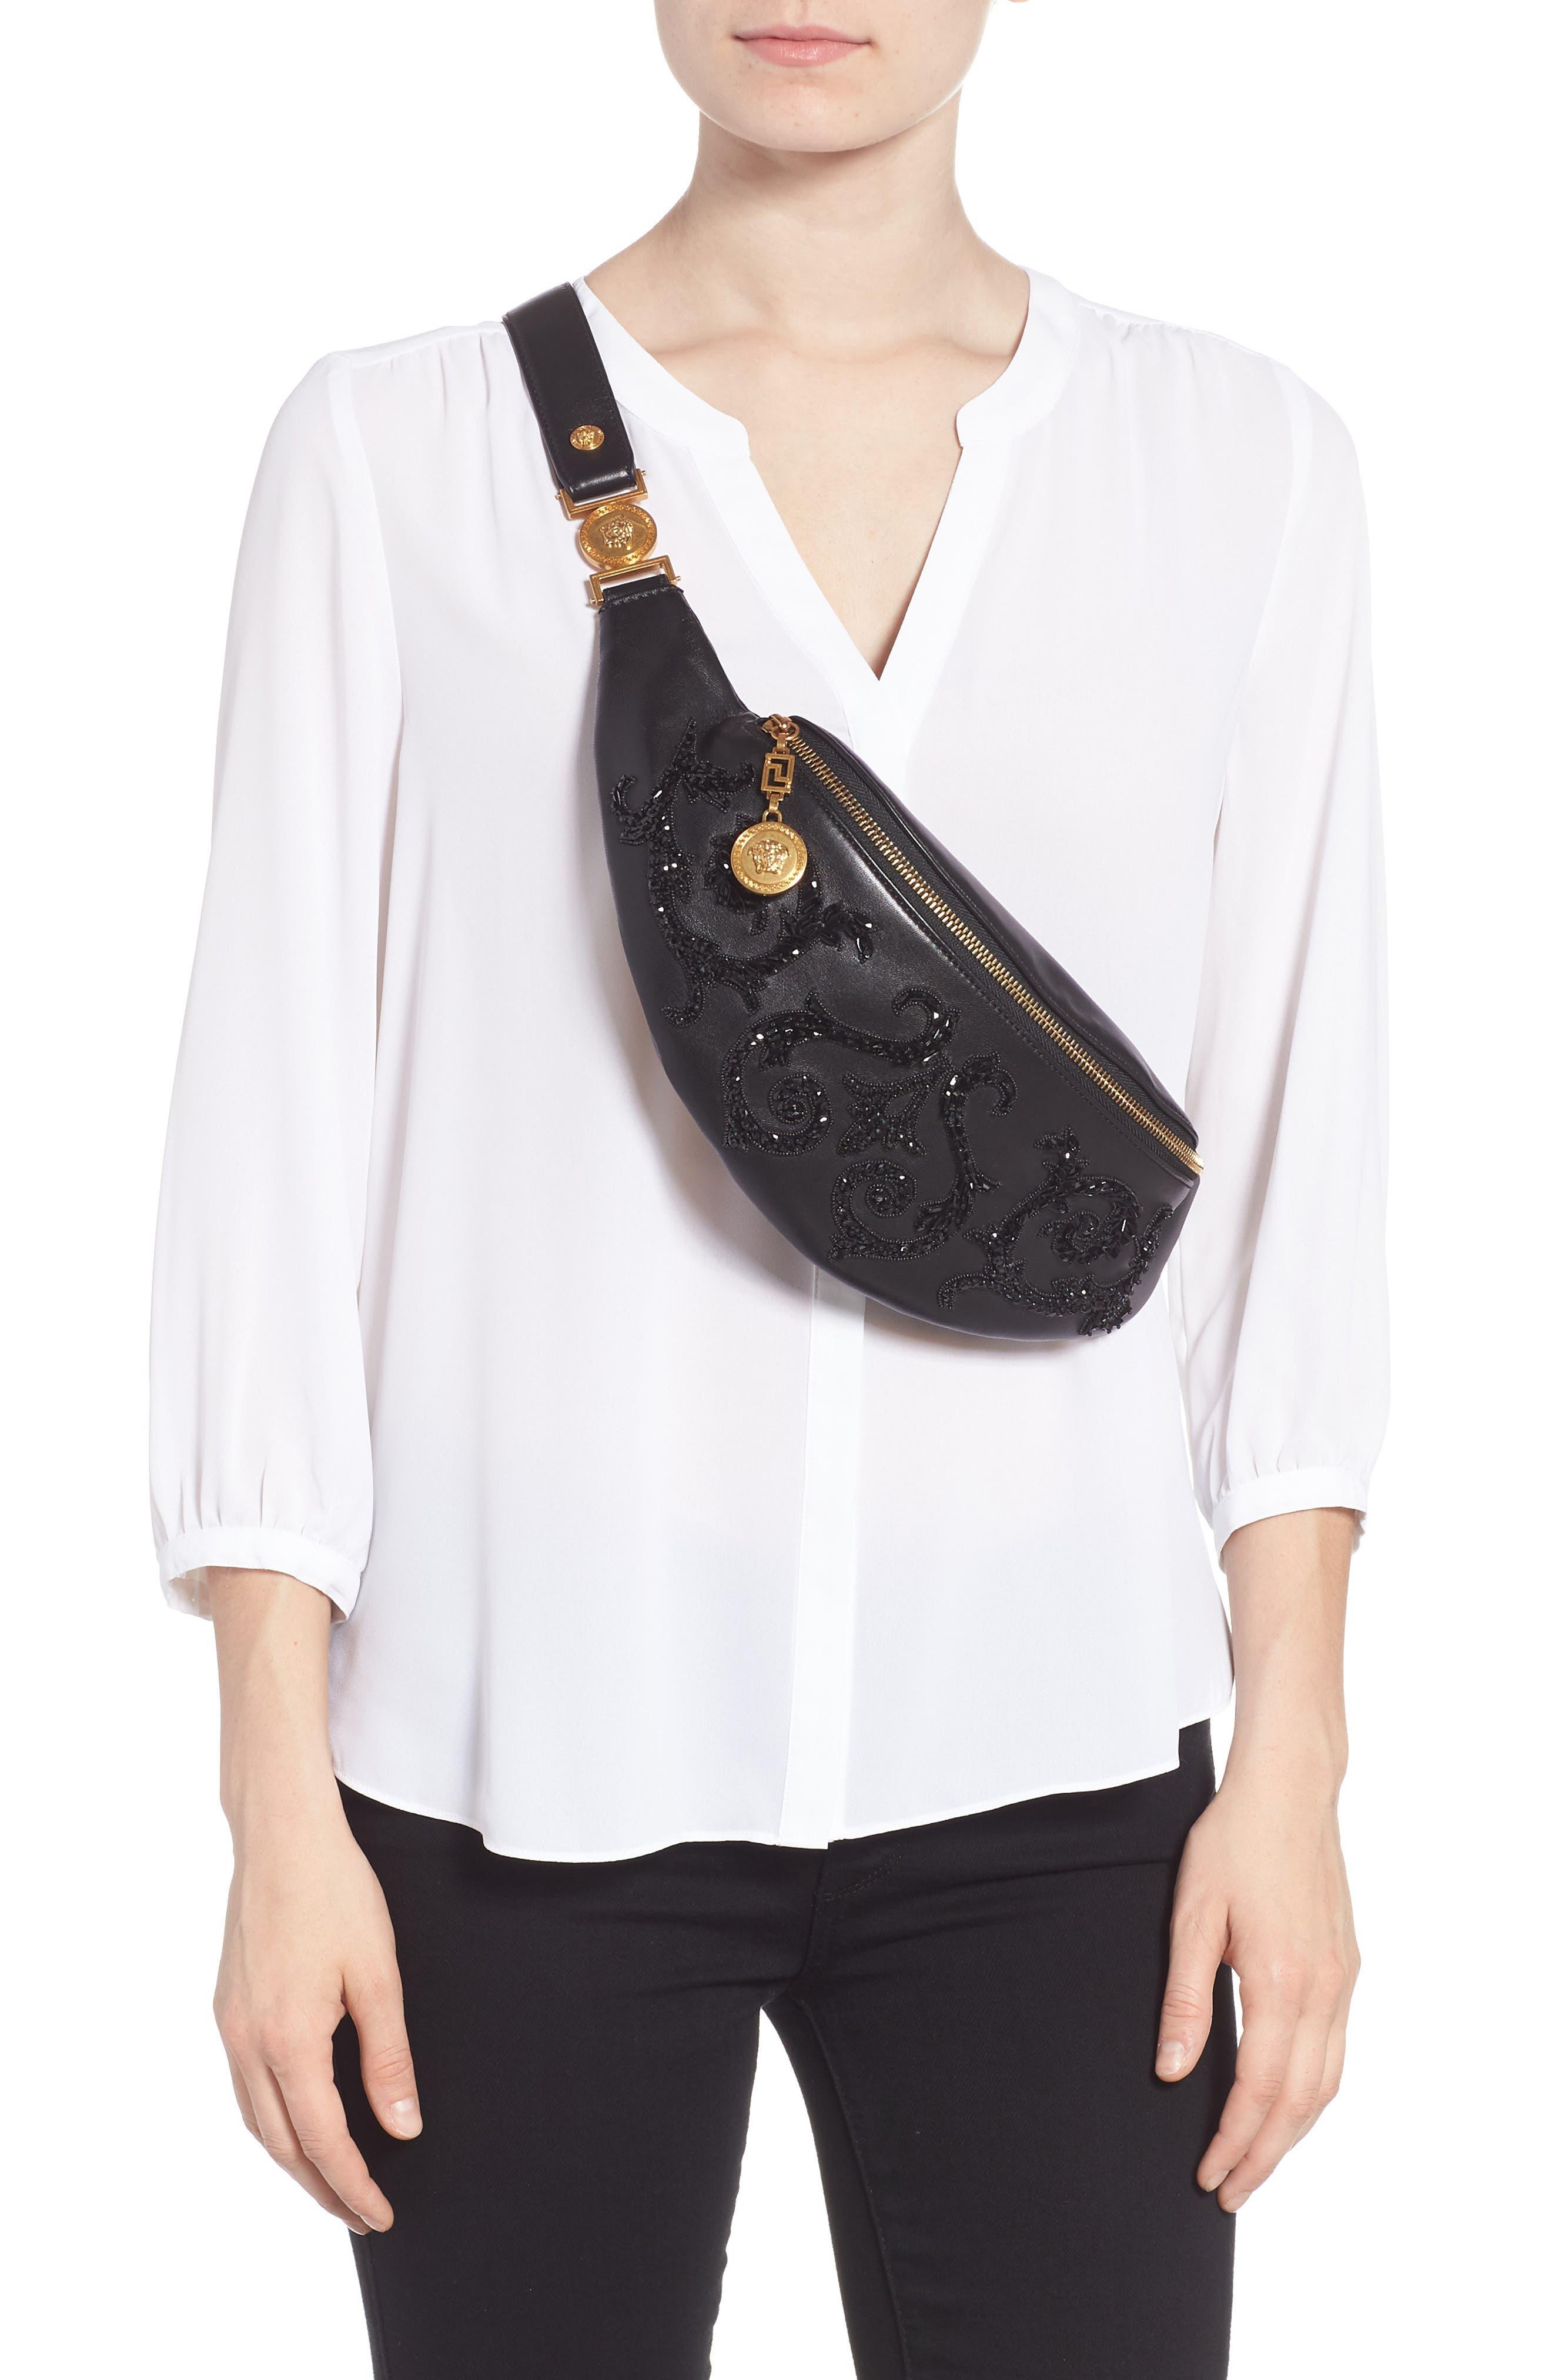 VERSACE COLLECTION,                             Versace Crystal Embellished Leather Belt Bag,                             Alternate thumbnail 3, color,                             NERO